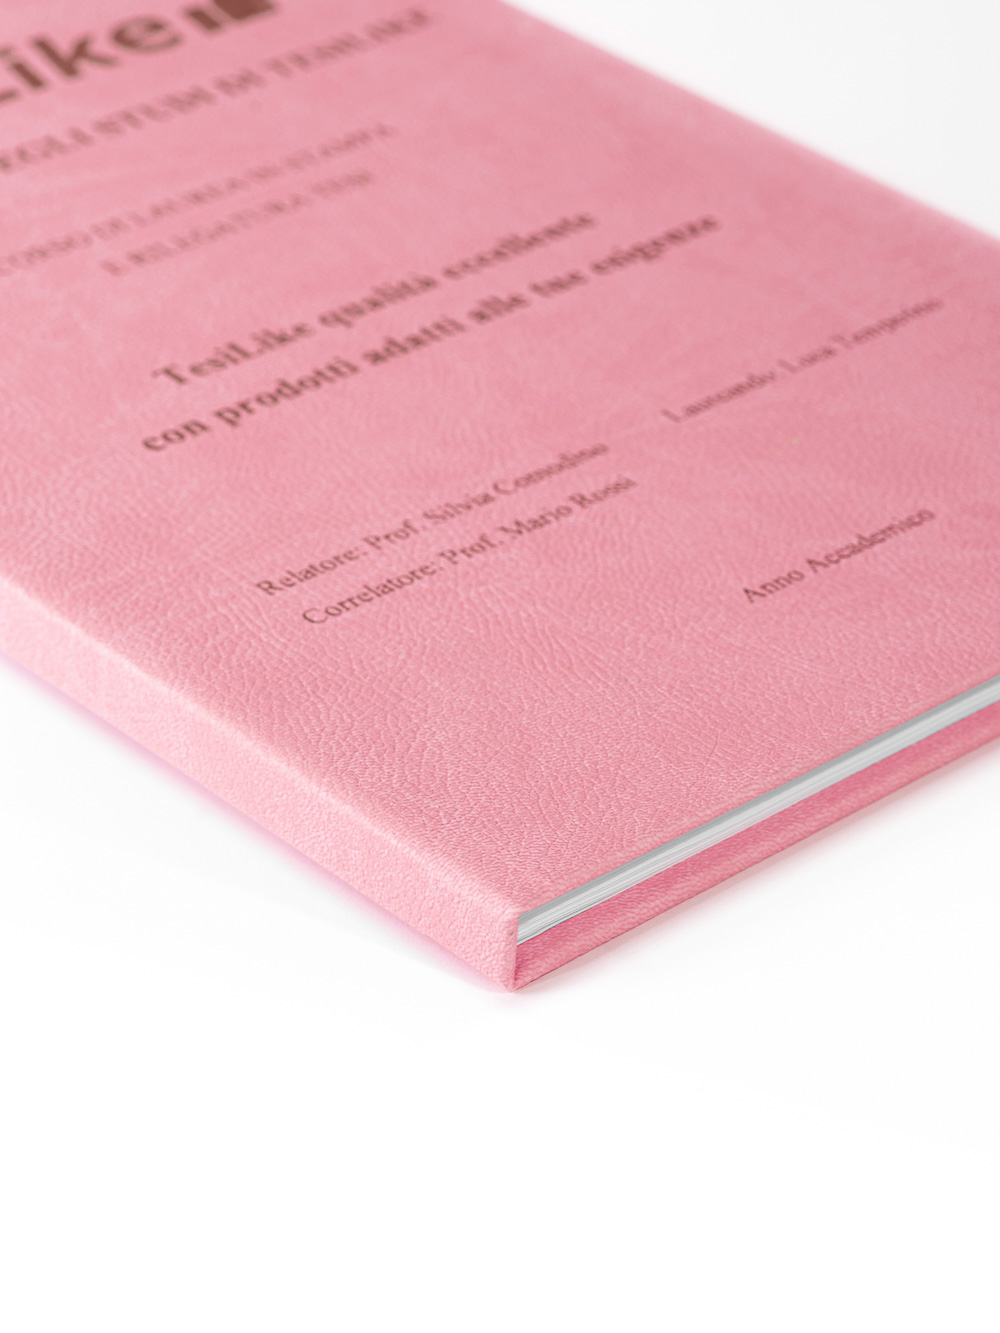 copertina-tesi-rigida-morbida-rosa-frontespizio-bronzo-dettaglio-tesilike